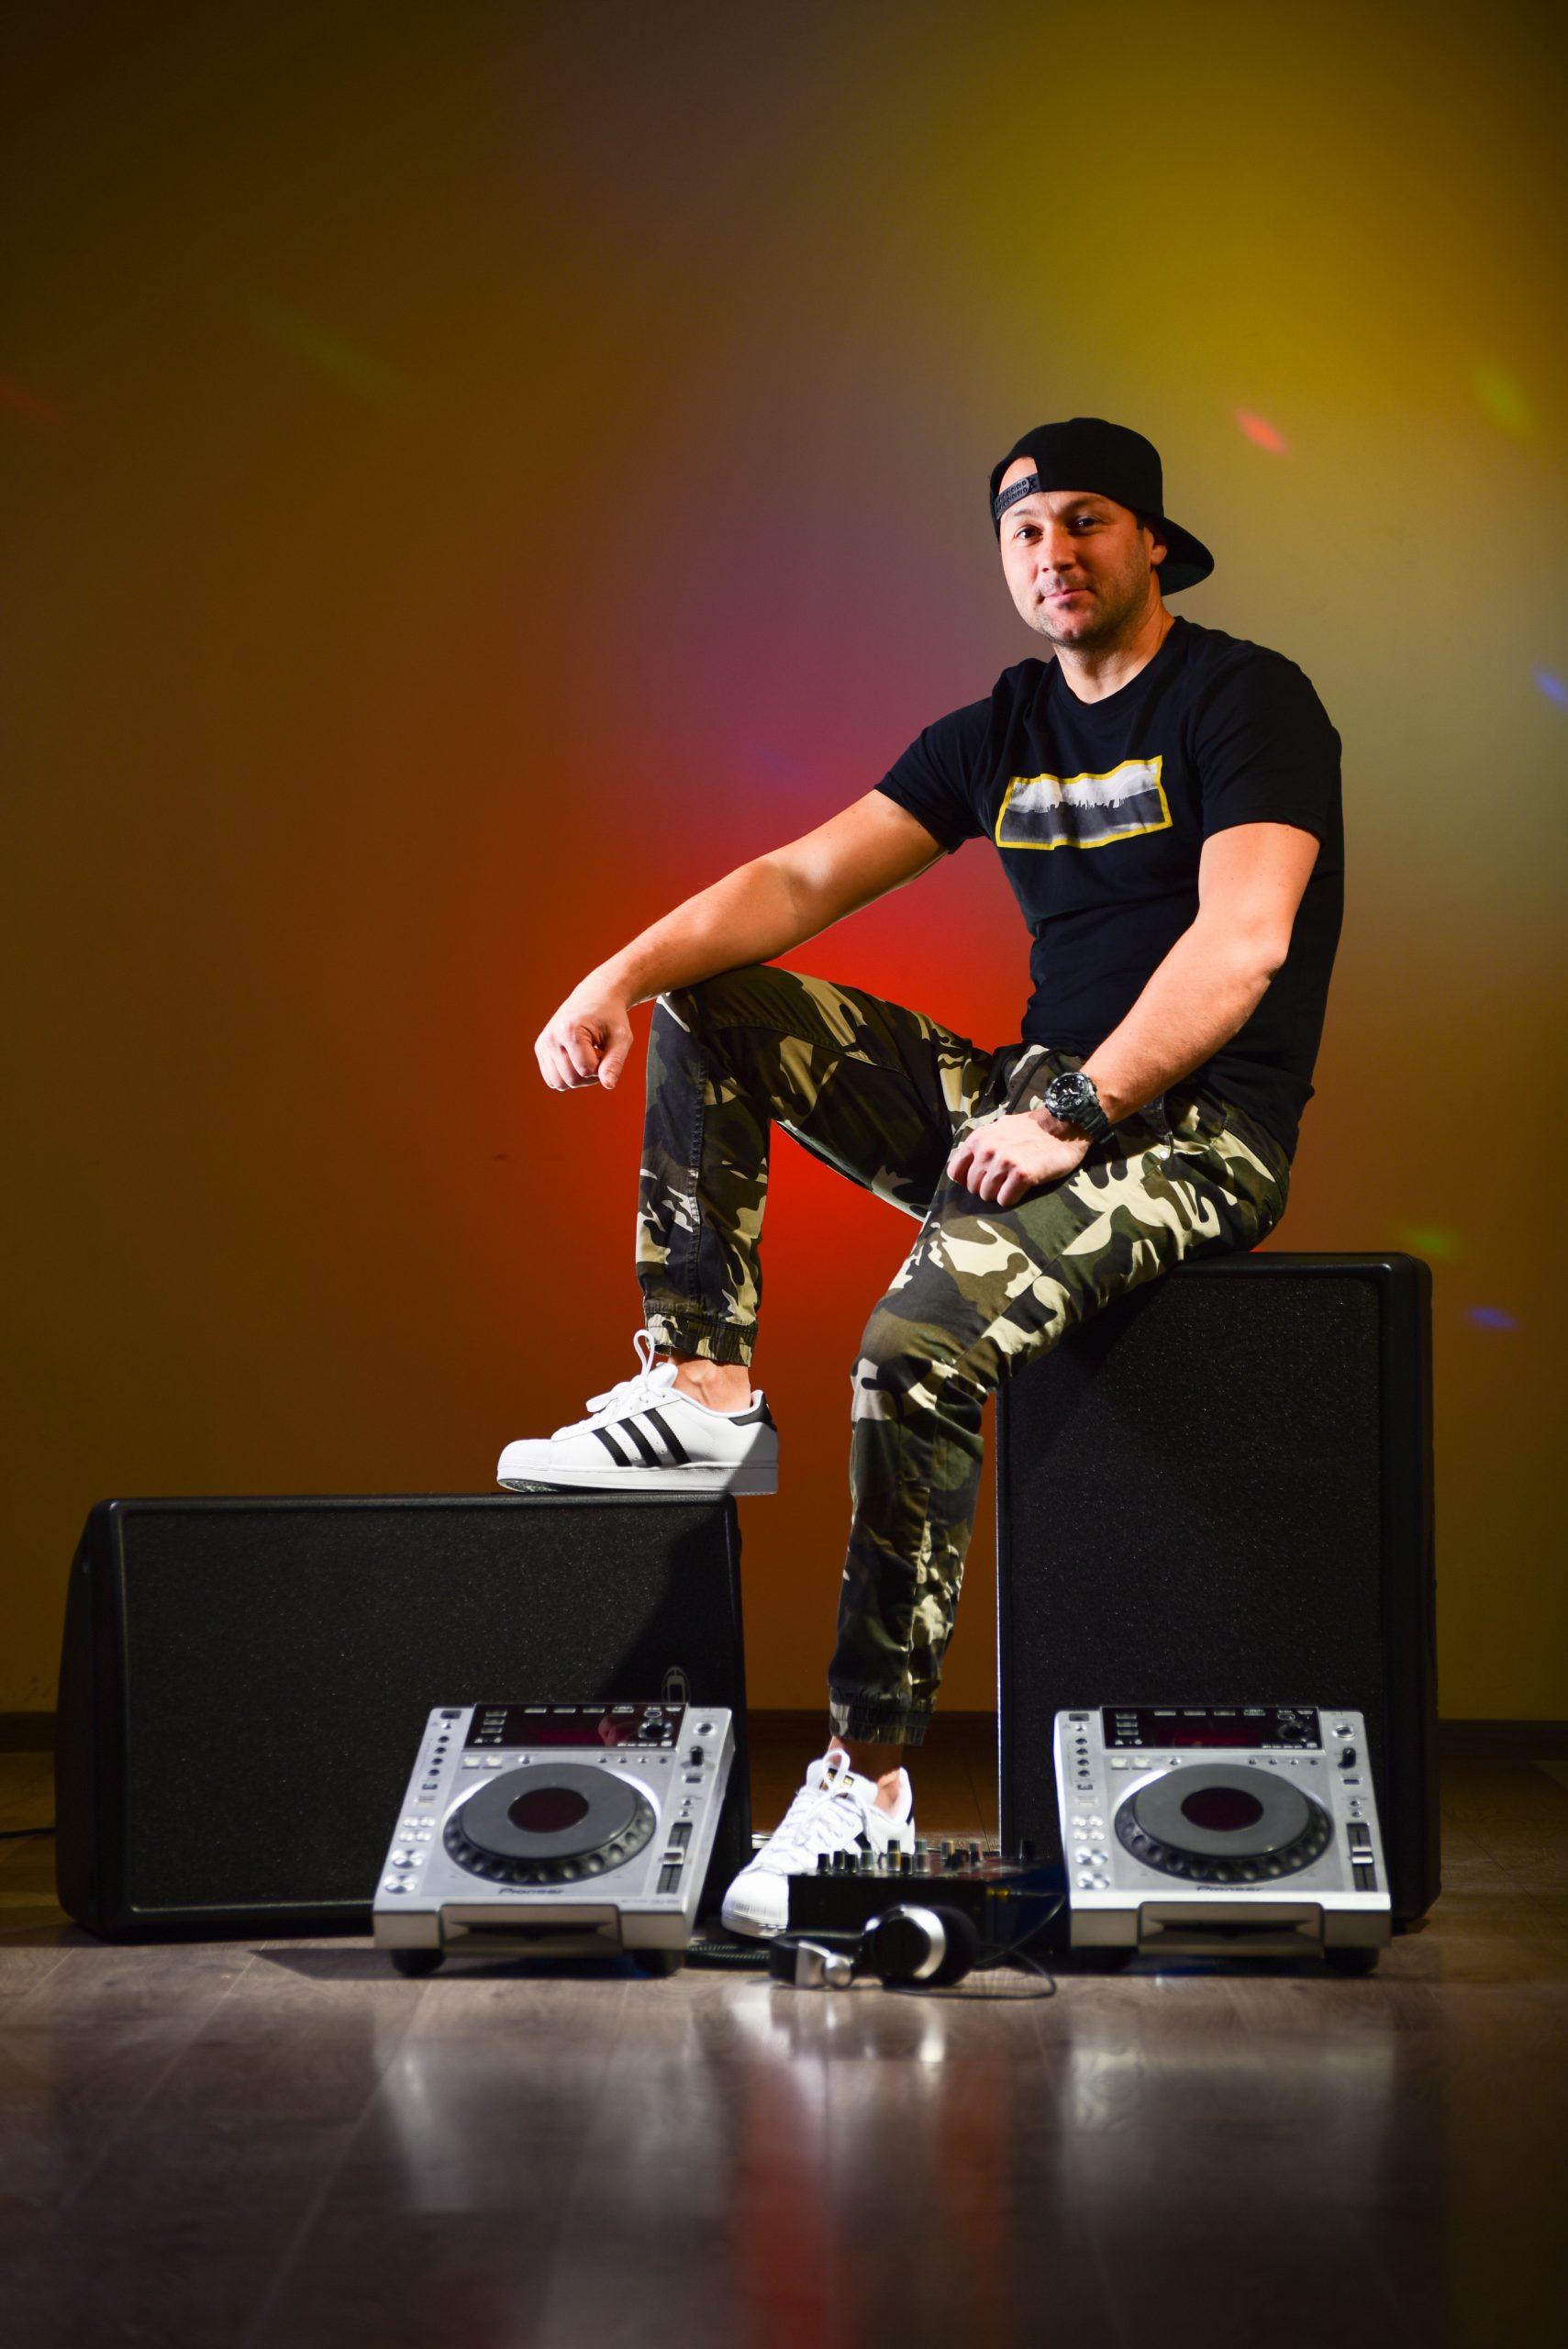 Петко Василев - DJ Petrakis - Пертито